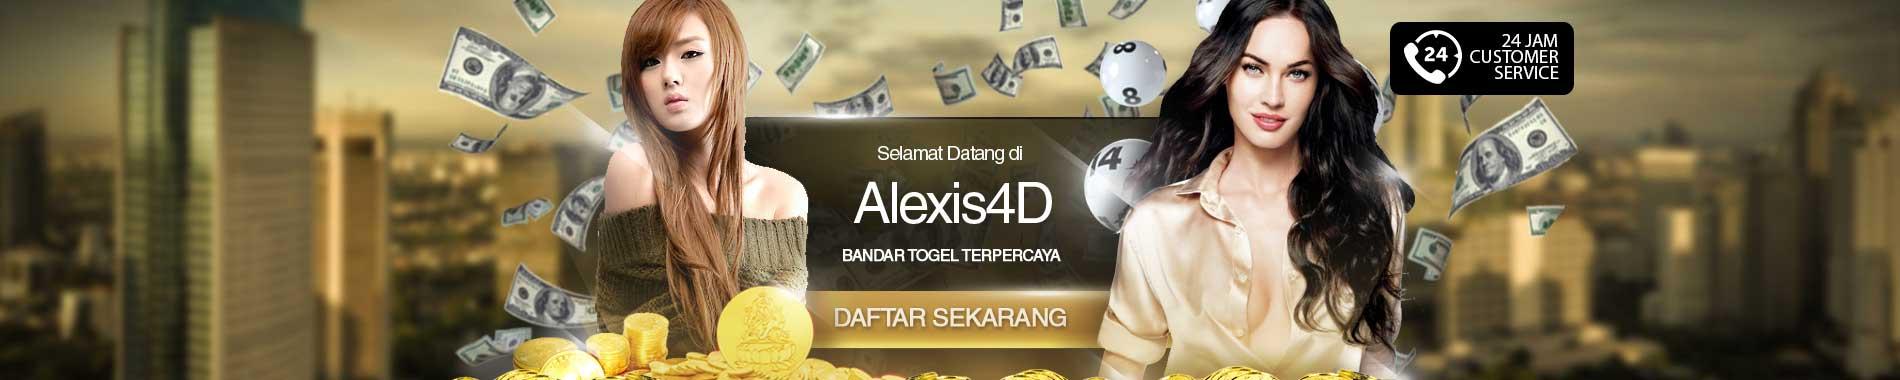 Free video poker deluxe